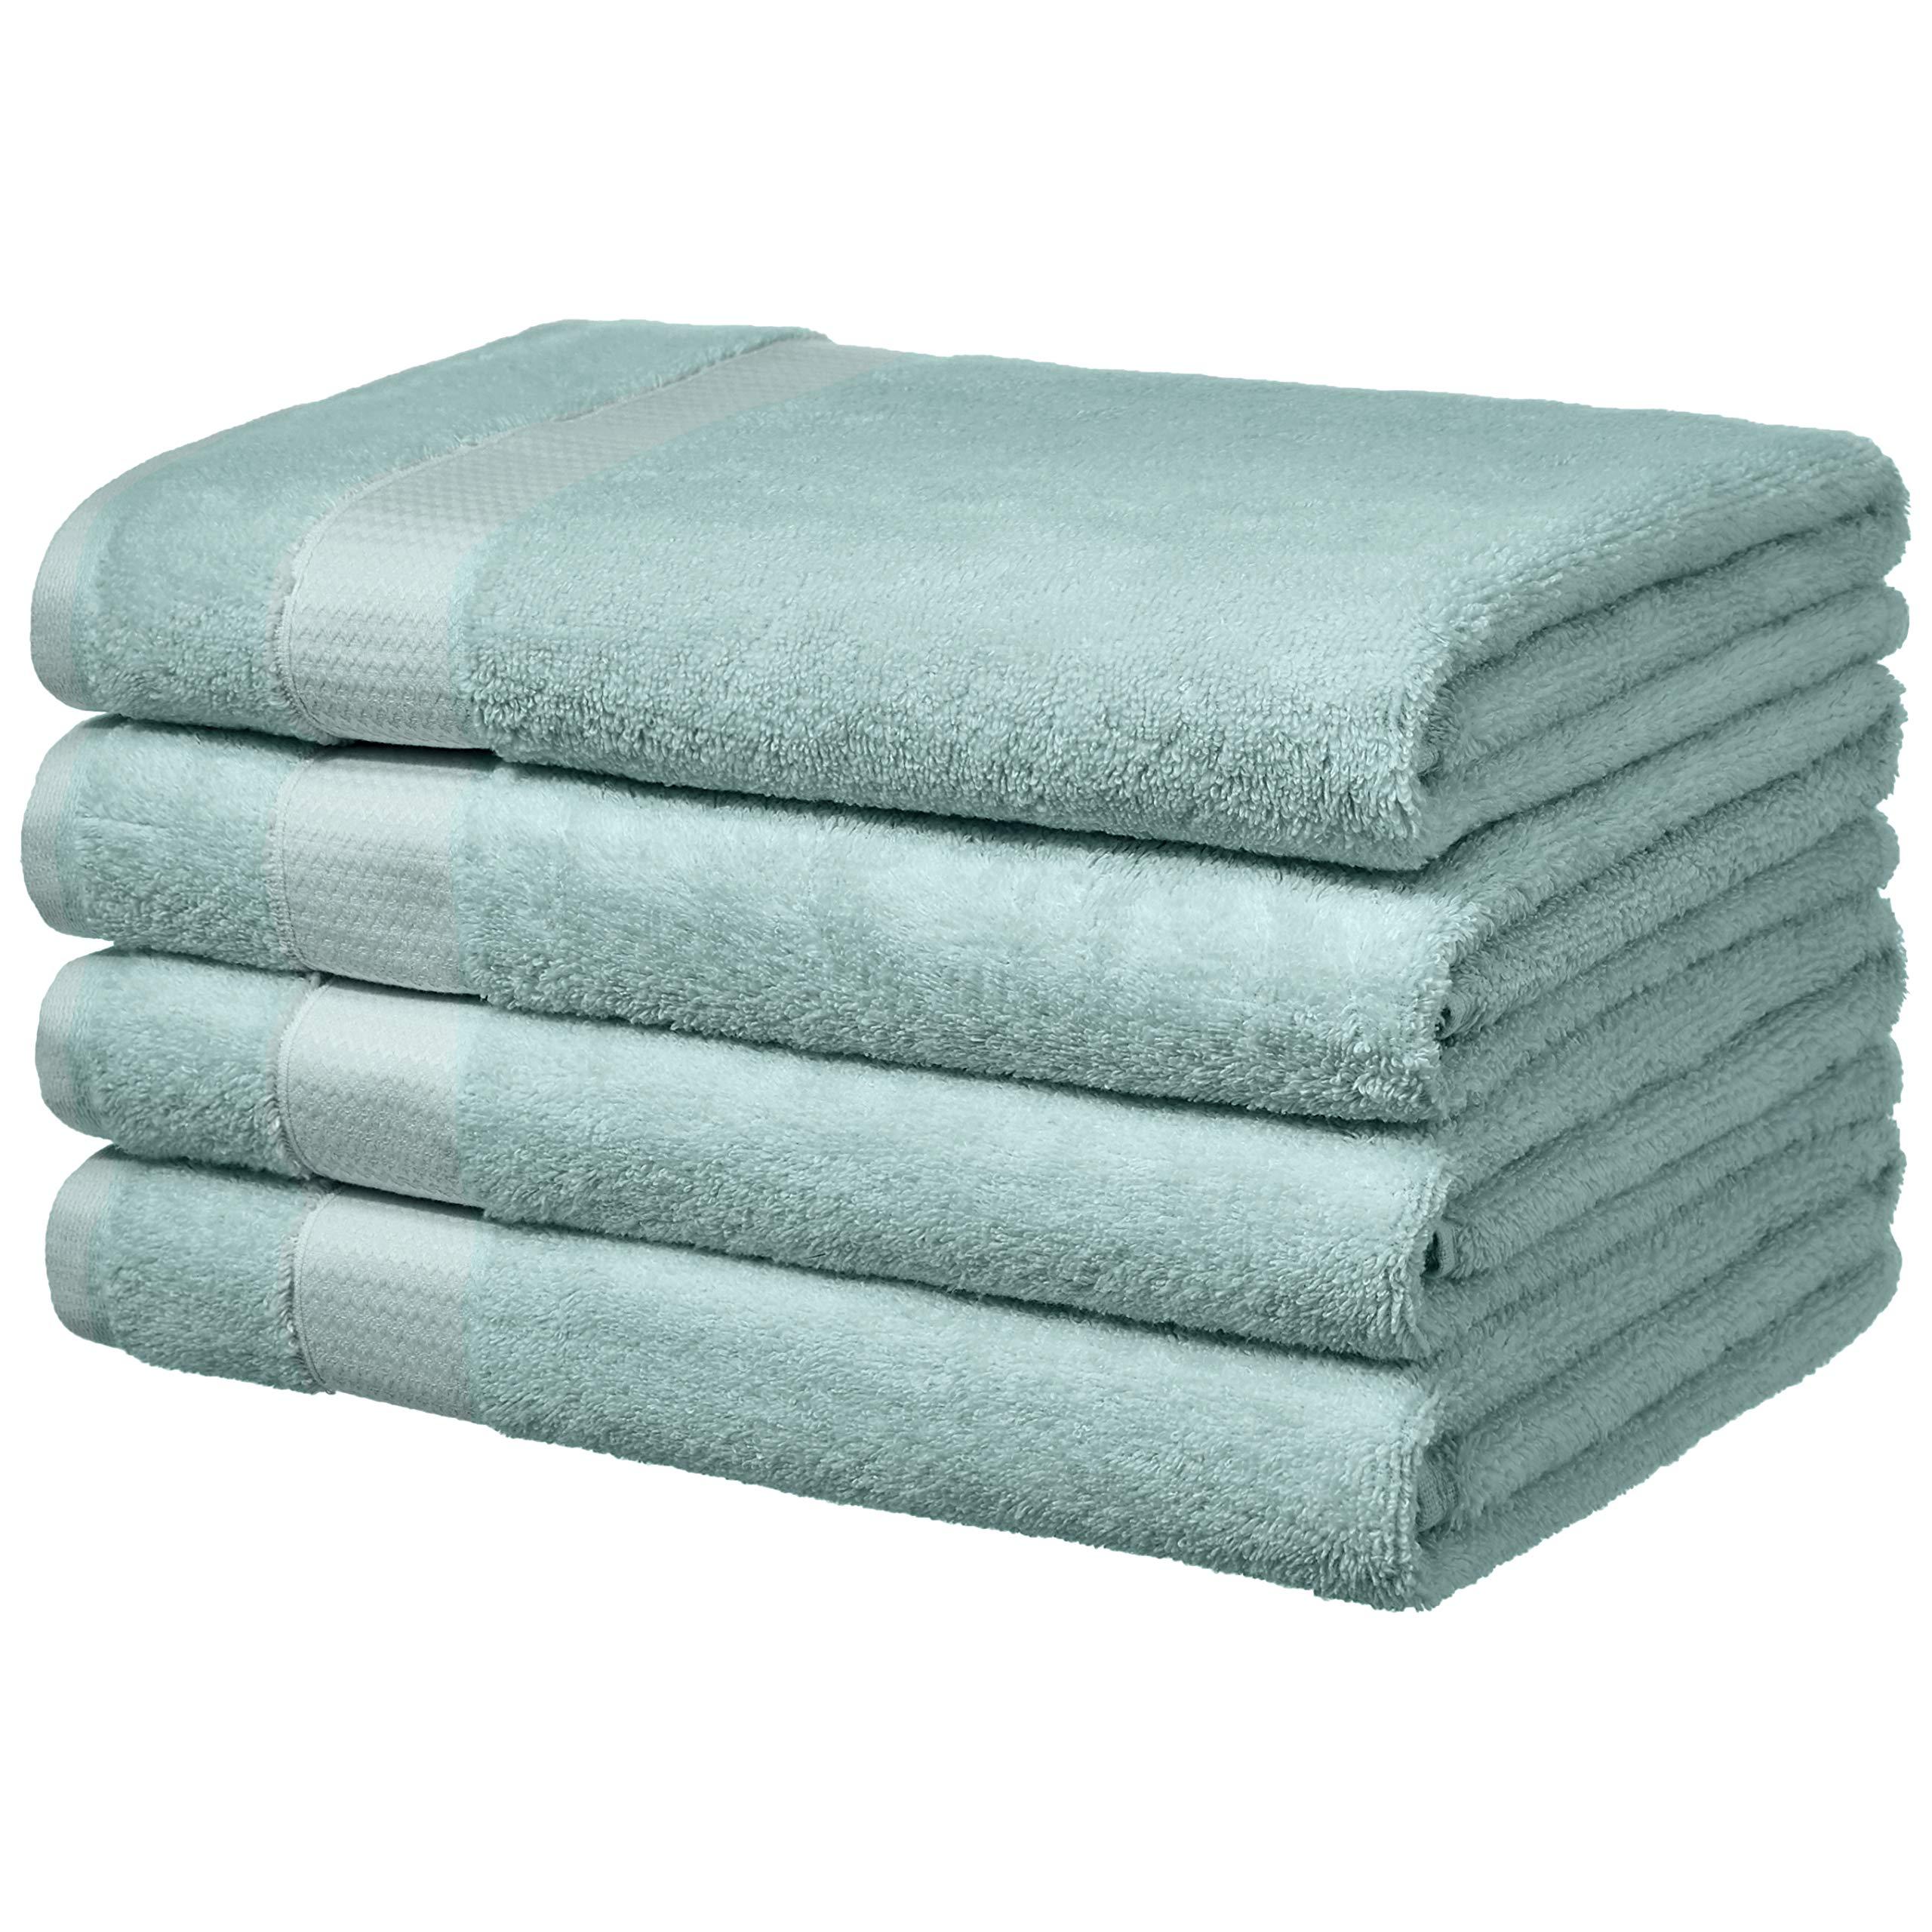 AmazonBasics Everyday Bath Towels - 4-Pack, Calm Blue